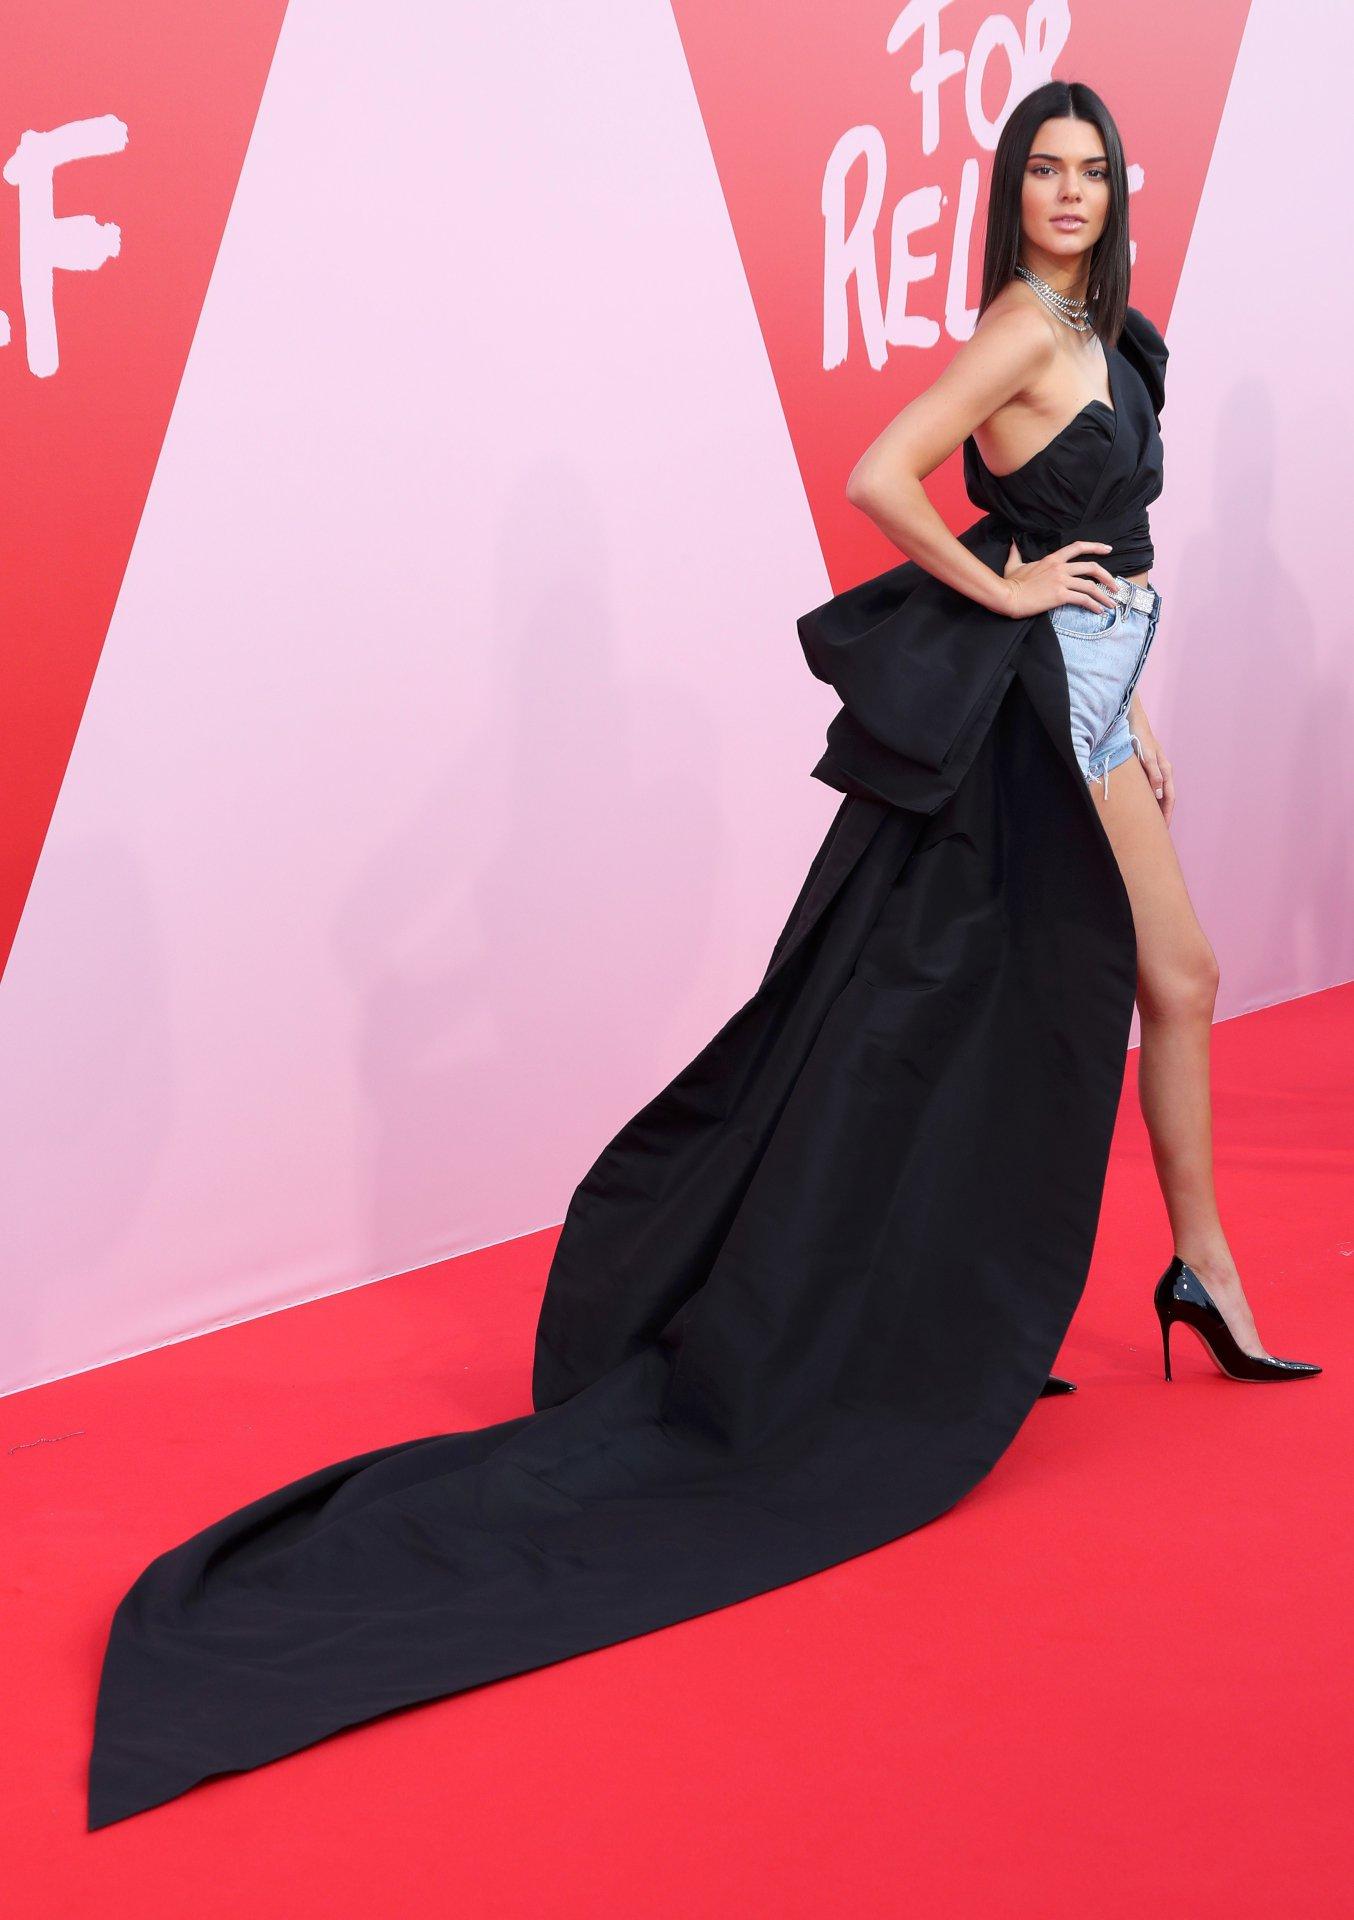 Kendall Jenner (17) | Hot Celebs Home Amanda Seyfried